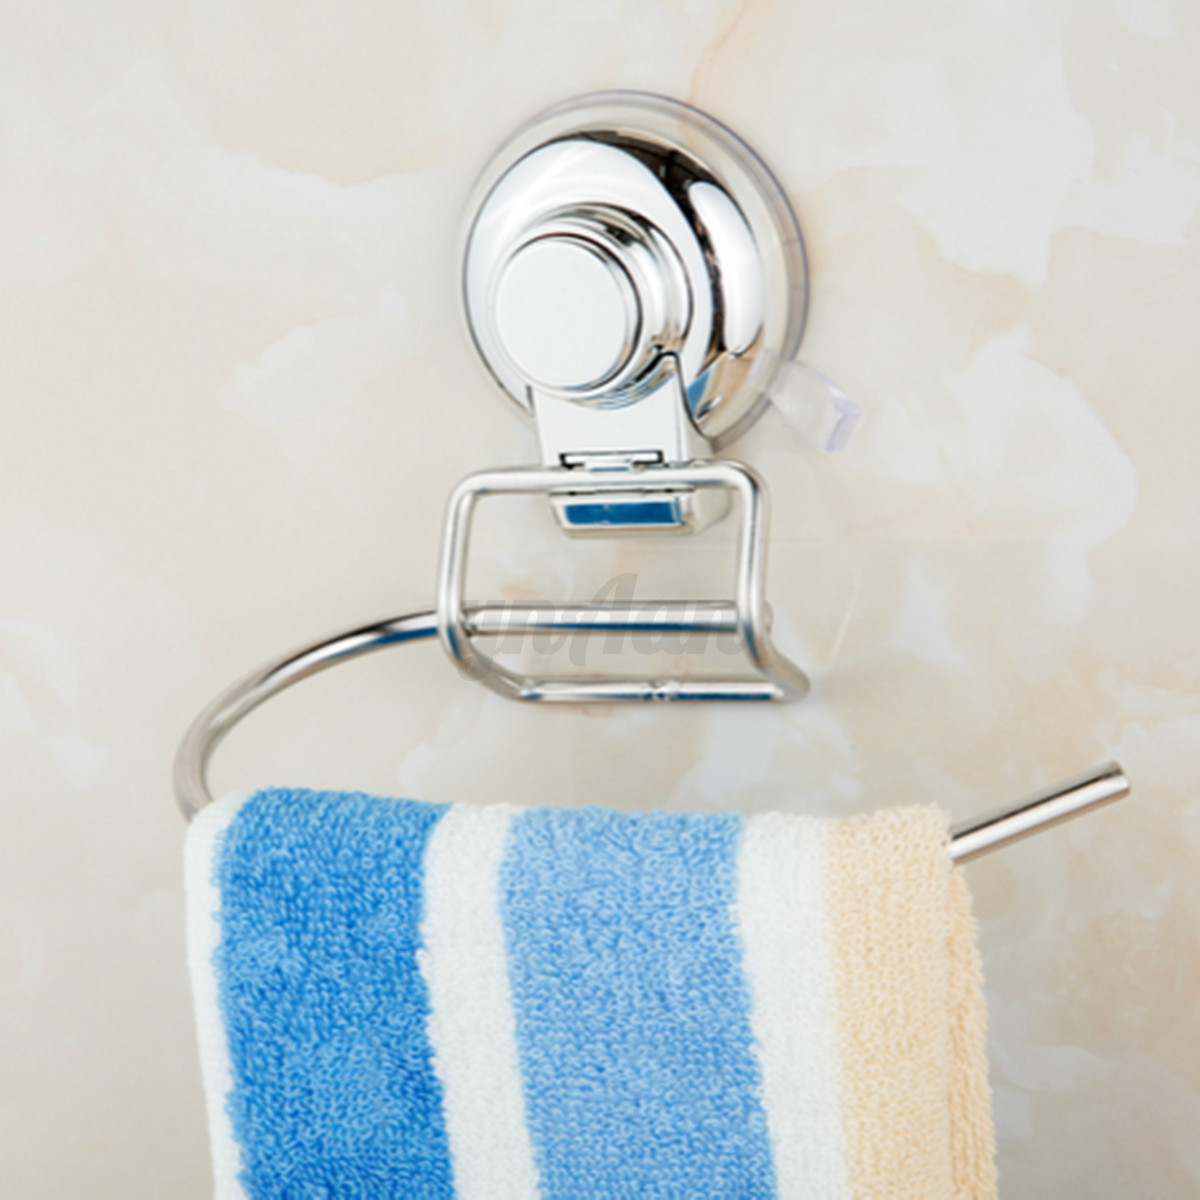 paper tissue towel rail holder wall mount bathroom rack stainless